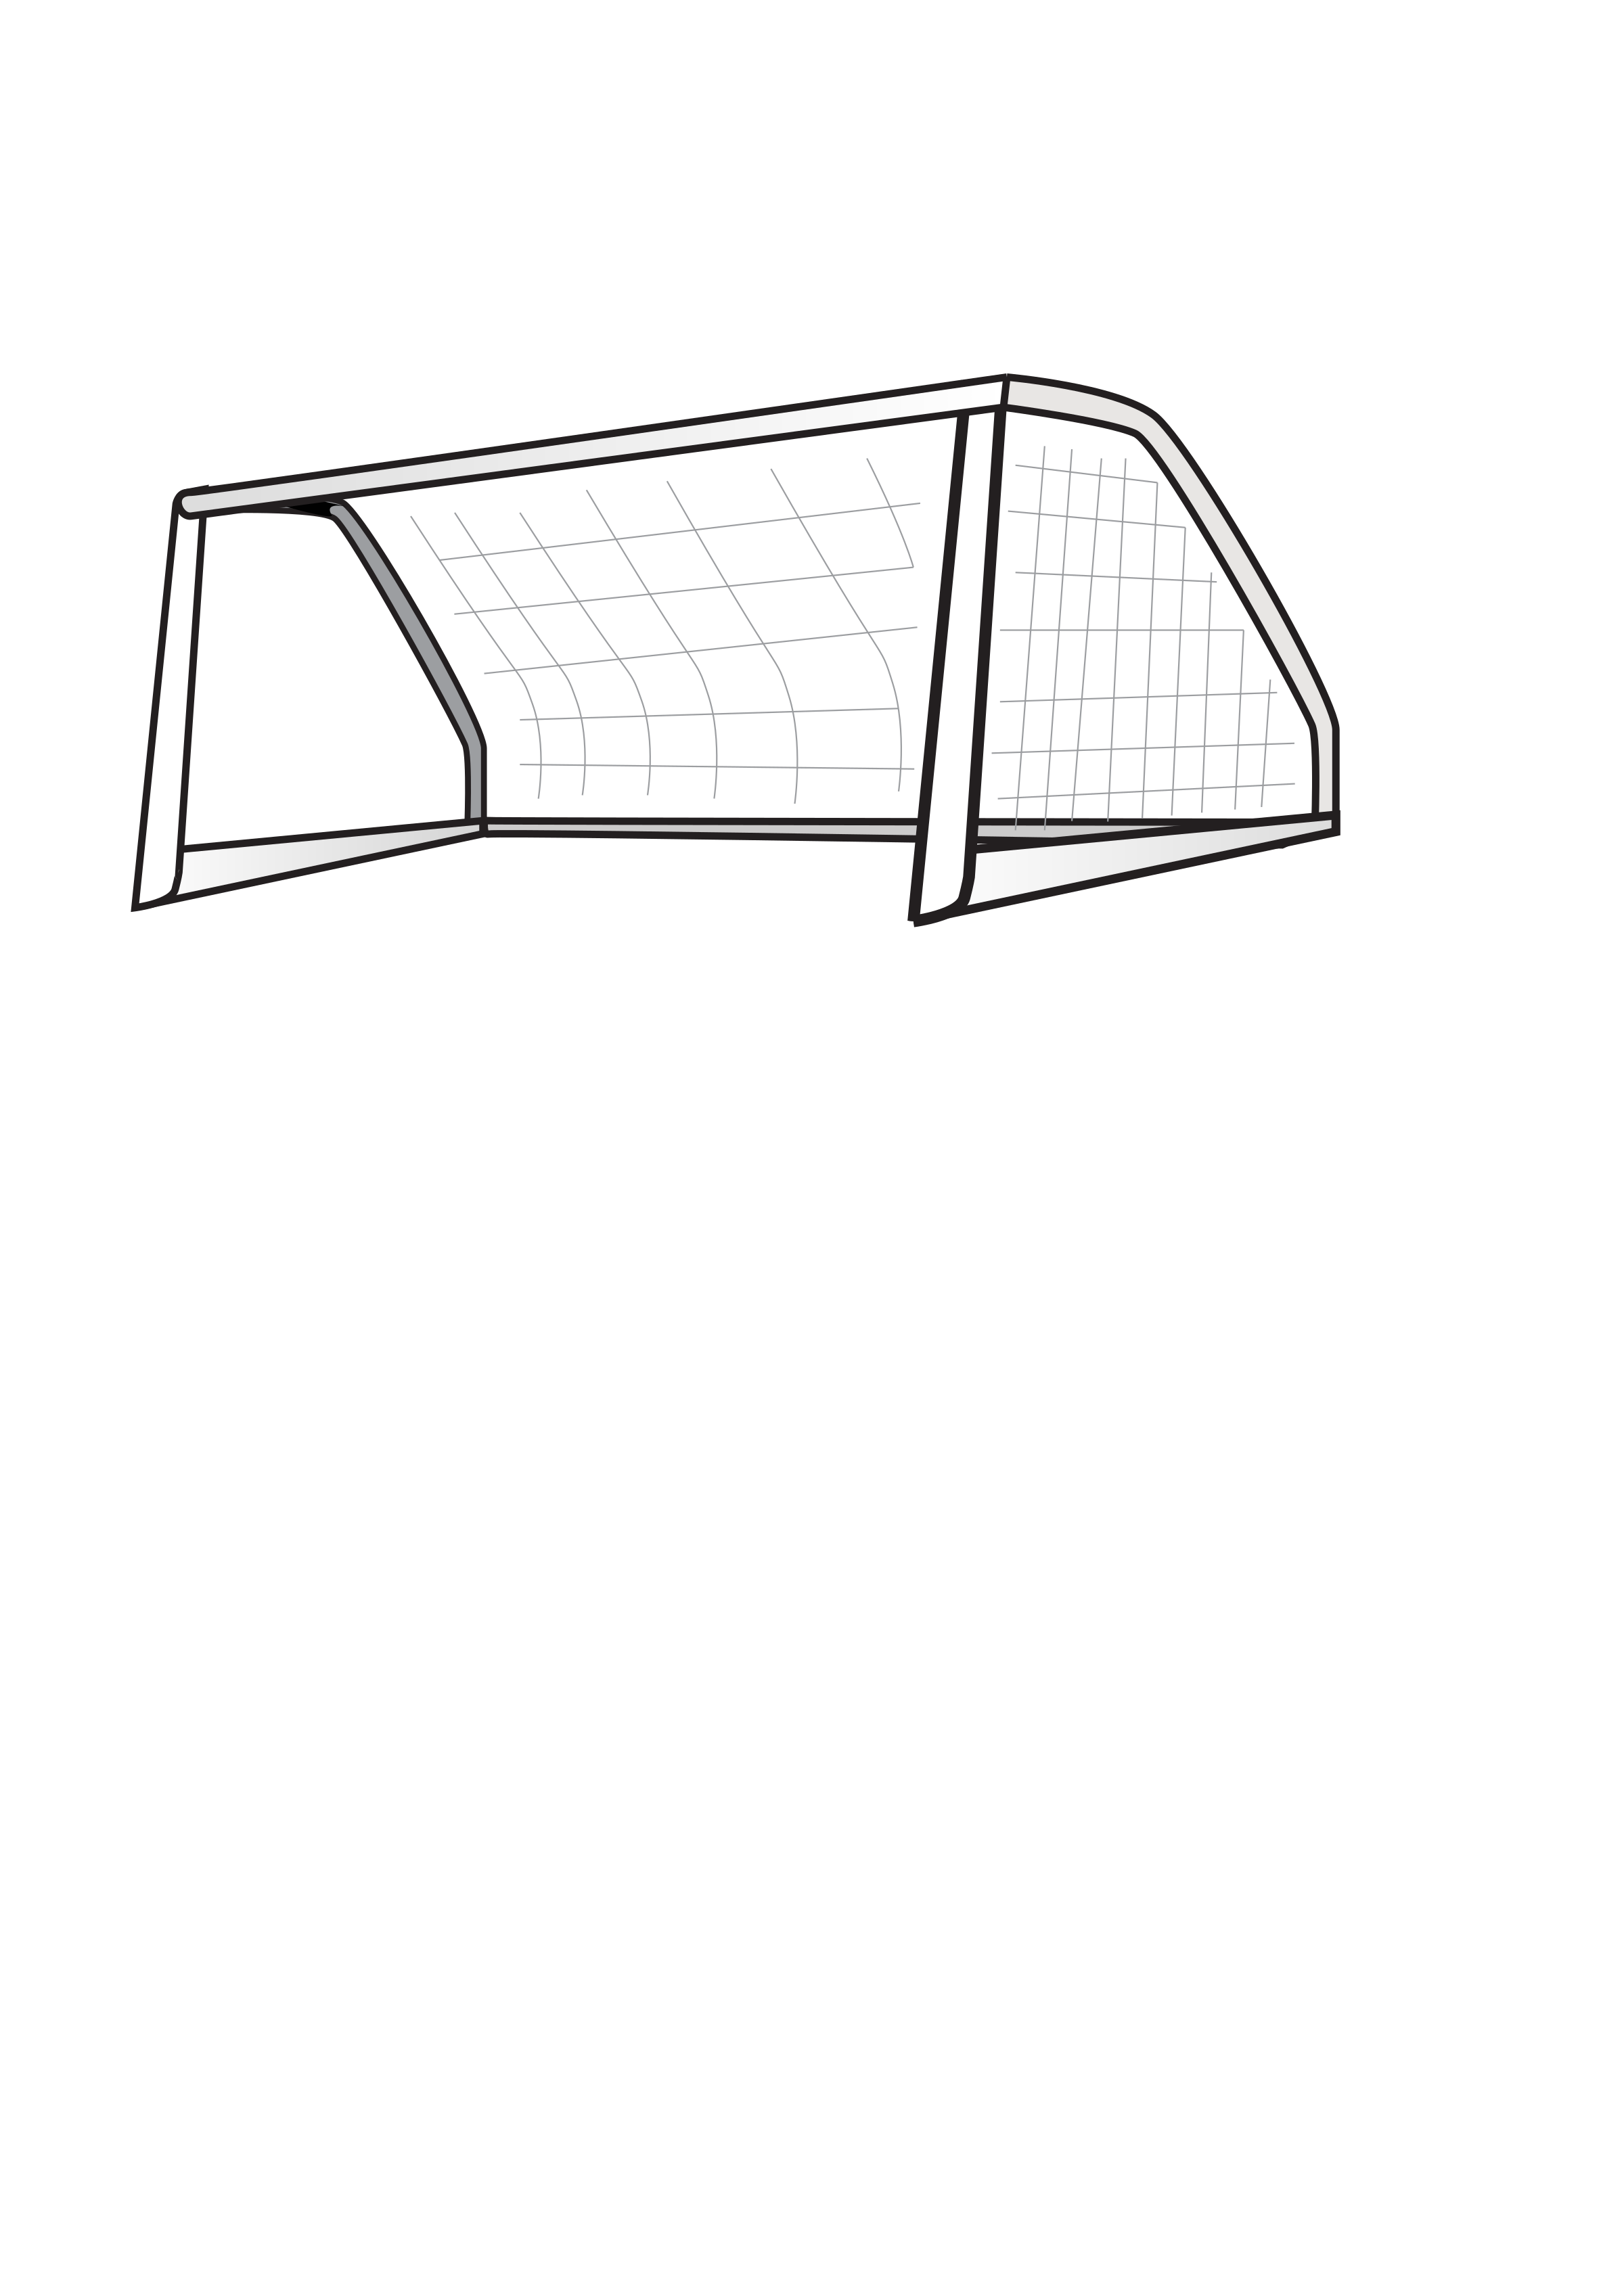 Soccer big image png. Football goal clipart